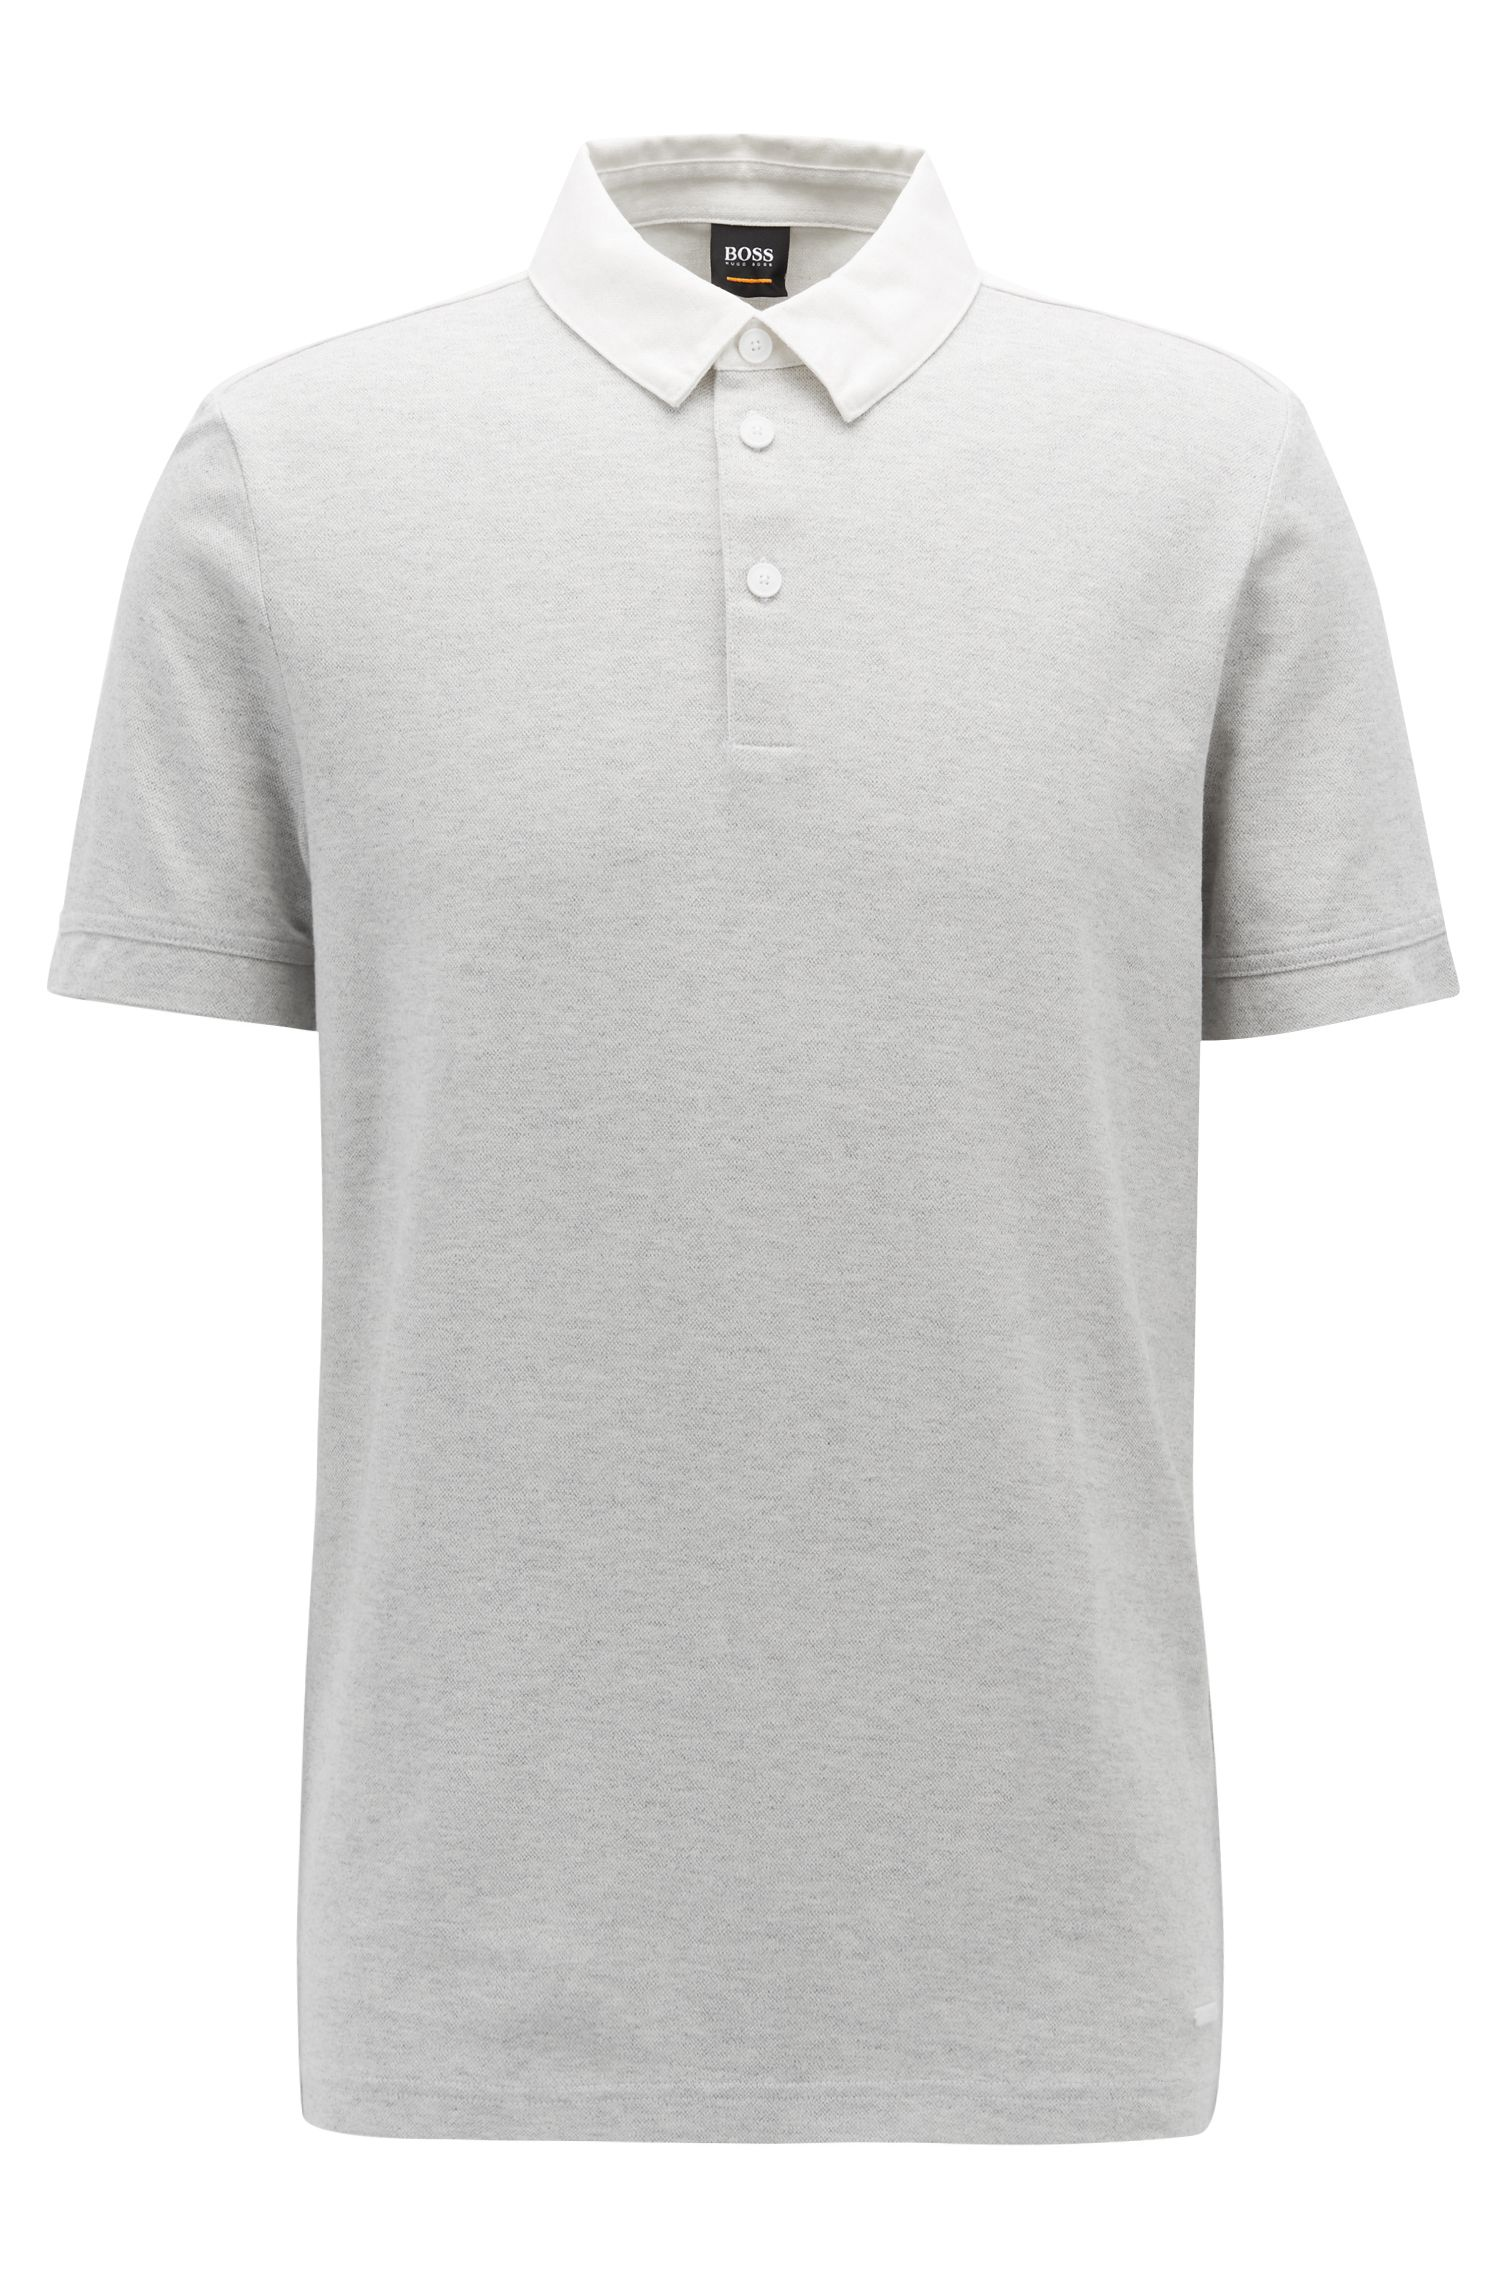 Polo chiné Relaxed Fit avec empiècement dos contrastant, Blanc